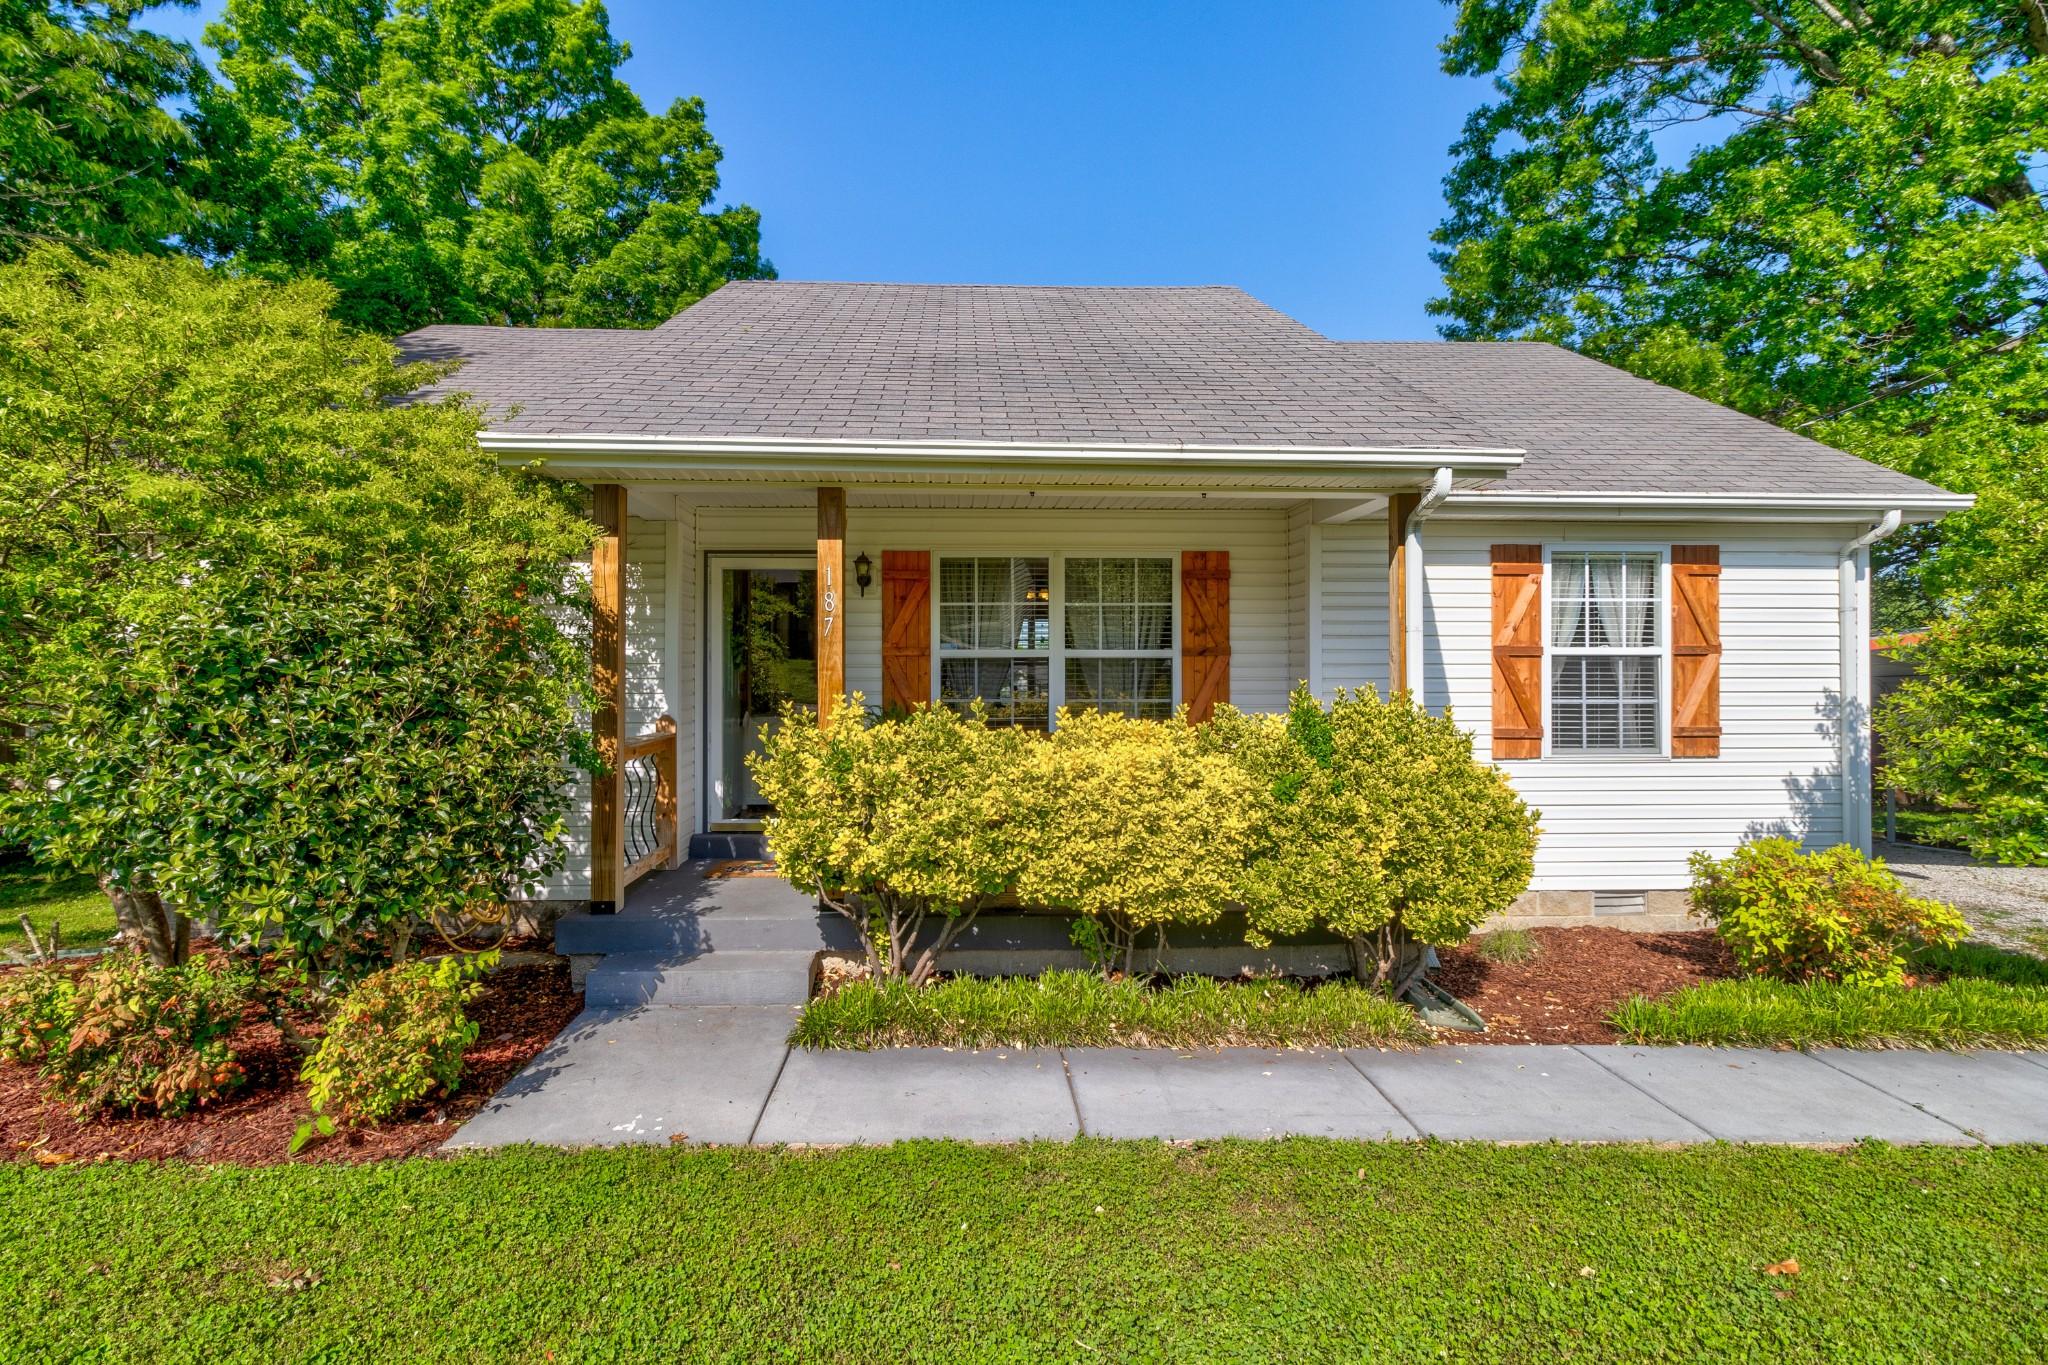 187 Center St Property Photo - LA VERGNE, TN real estate listing